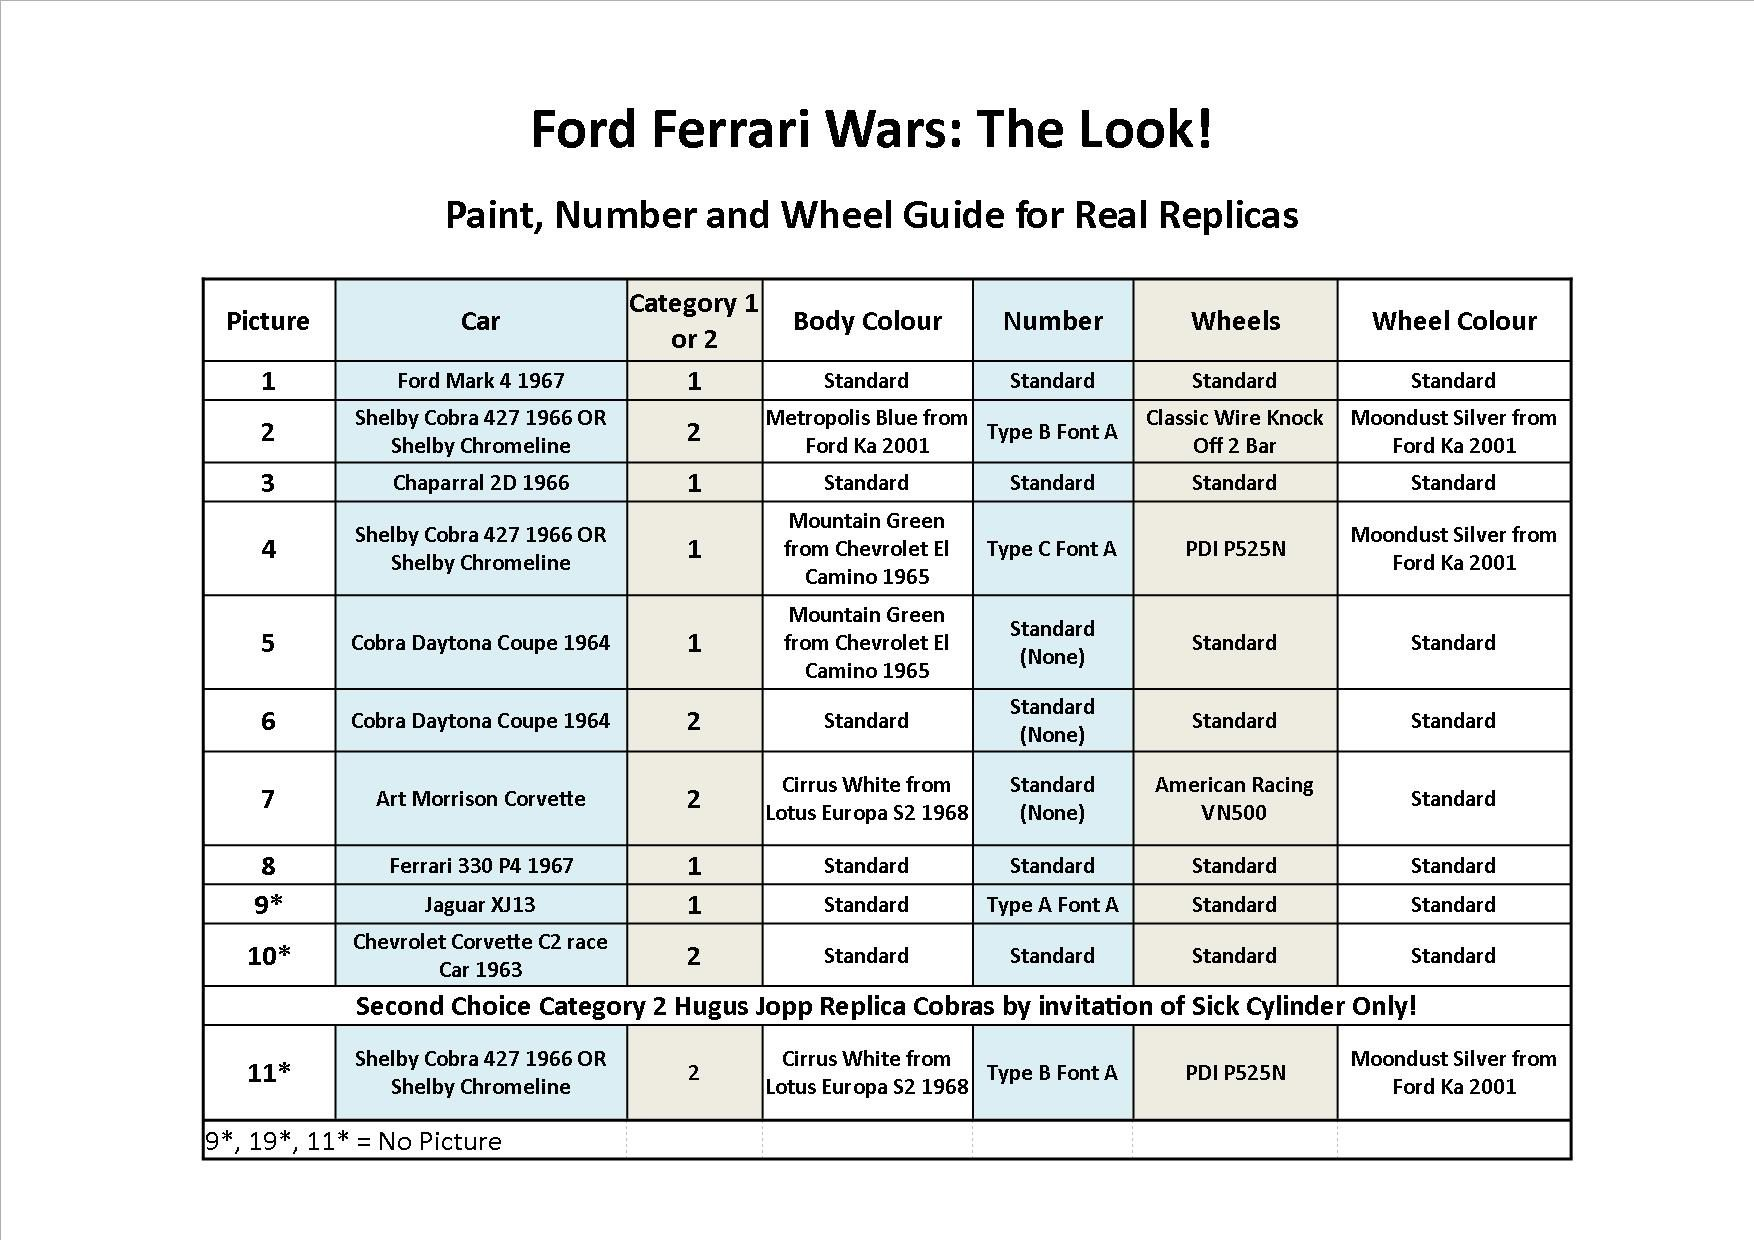 Ford Ferrari Wars Replica Guide Poster.jpg